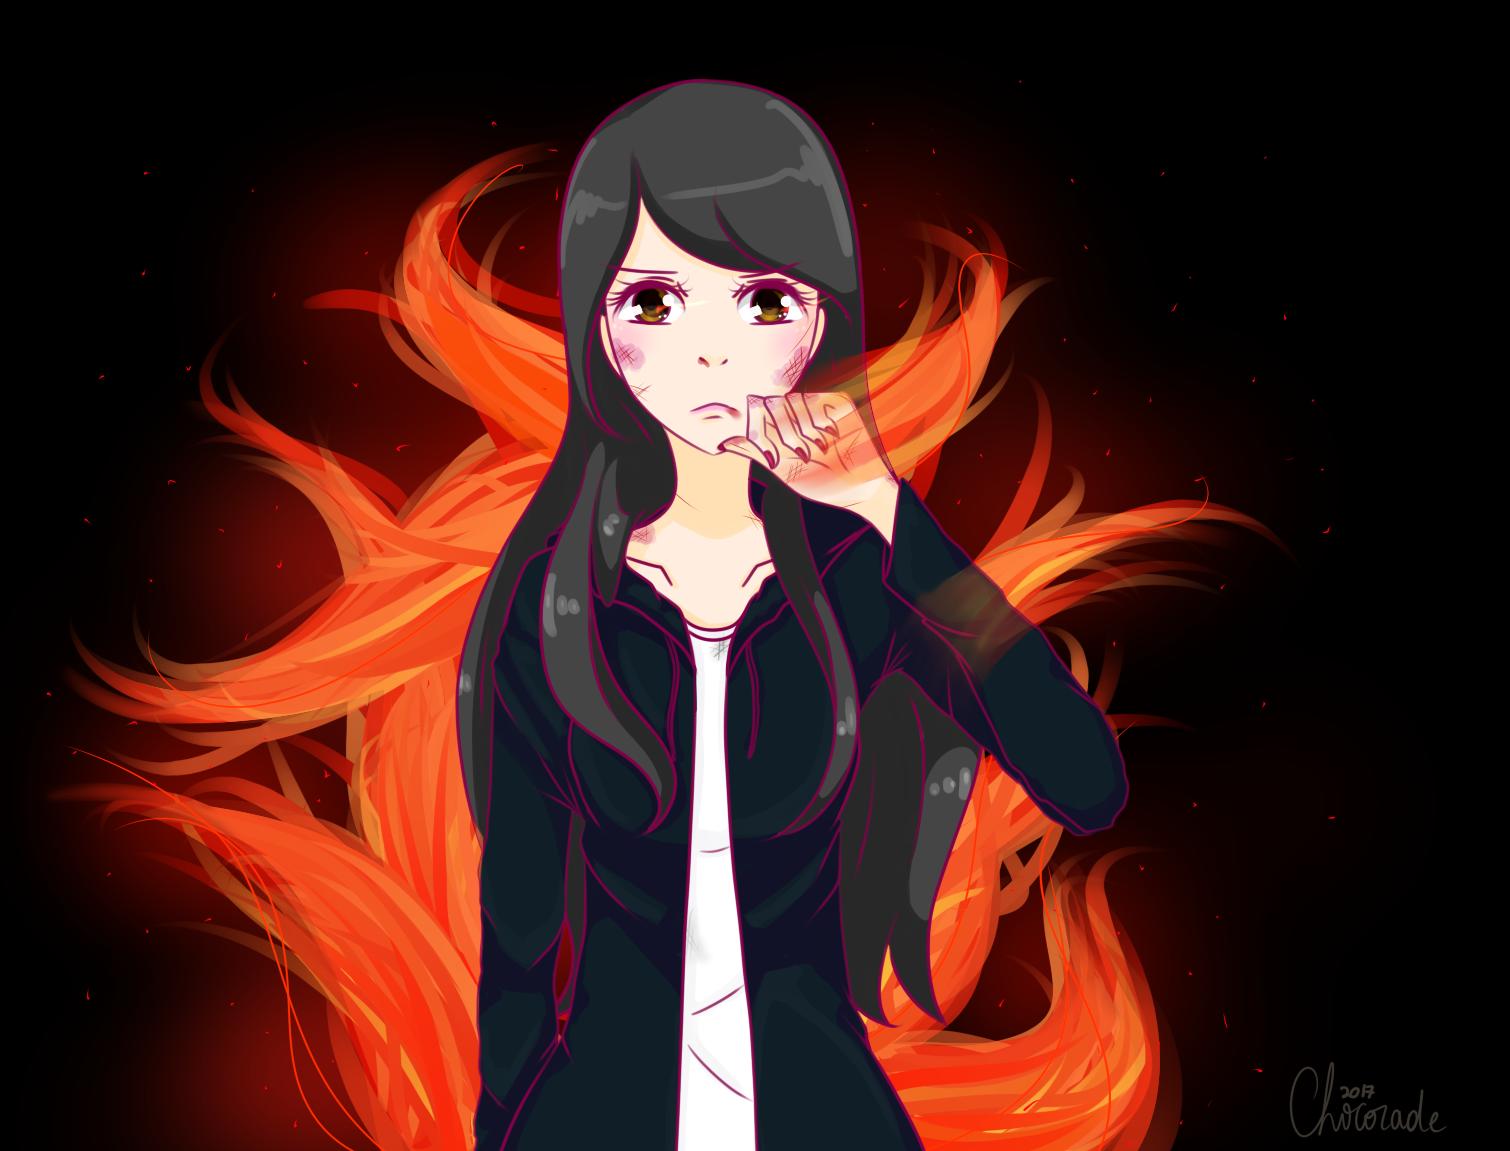 Fire by Chocorabitsu